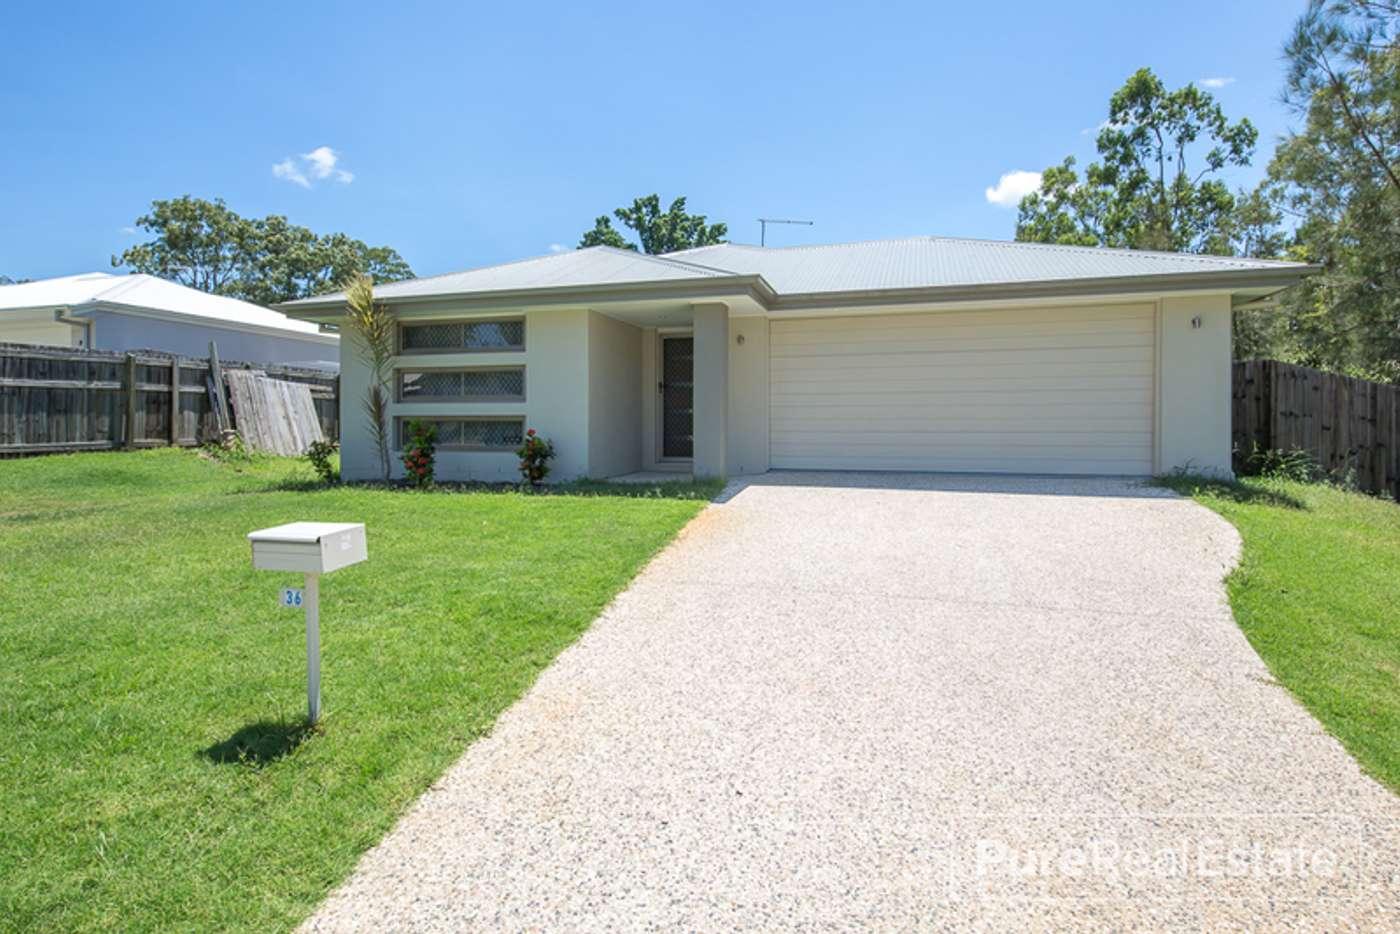 Main view of Homely house listing, 36 Knightsbridge Drive, Chuwar QLD 4306